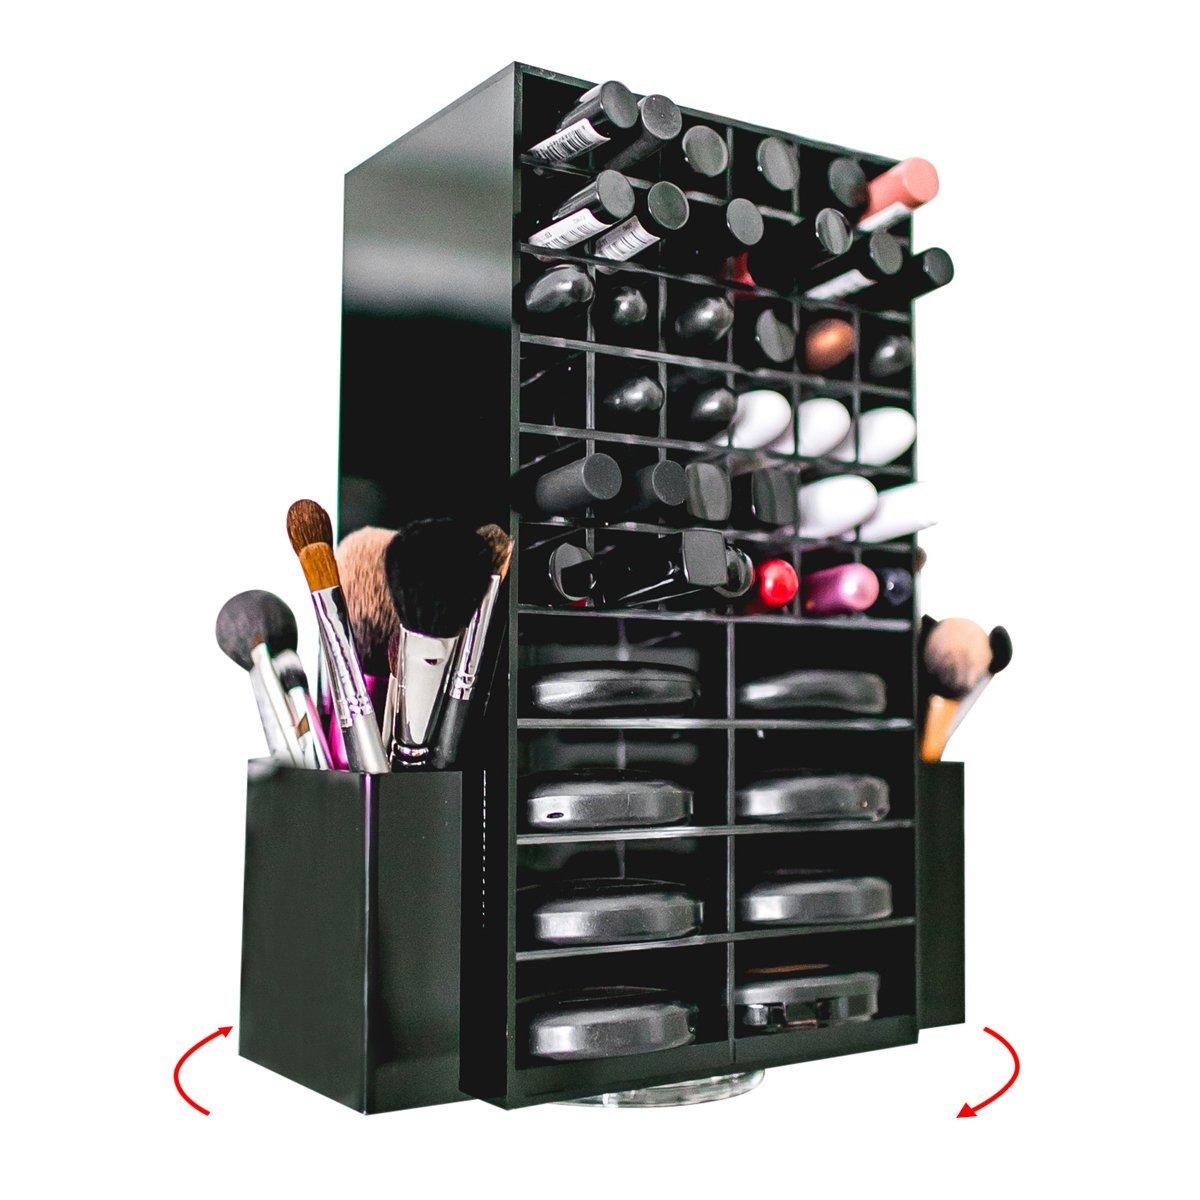 Get Quotations · Spinning Acrylic Makeup Organizer Carousel - Holds 72 Lipstick Holder Slots Brushes u0026 16 Powder  sc 1 st  Alibaba & Cheap Makeup Organizer Spinning find Makeup Organizer Spinning ...